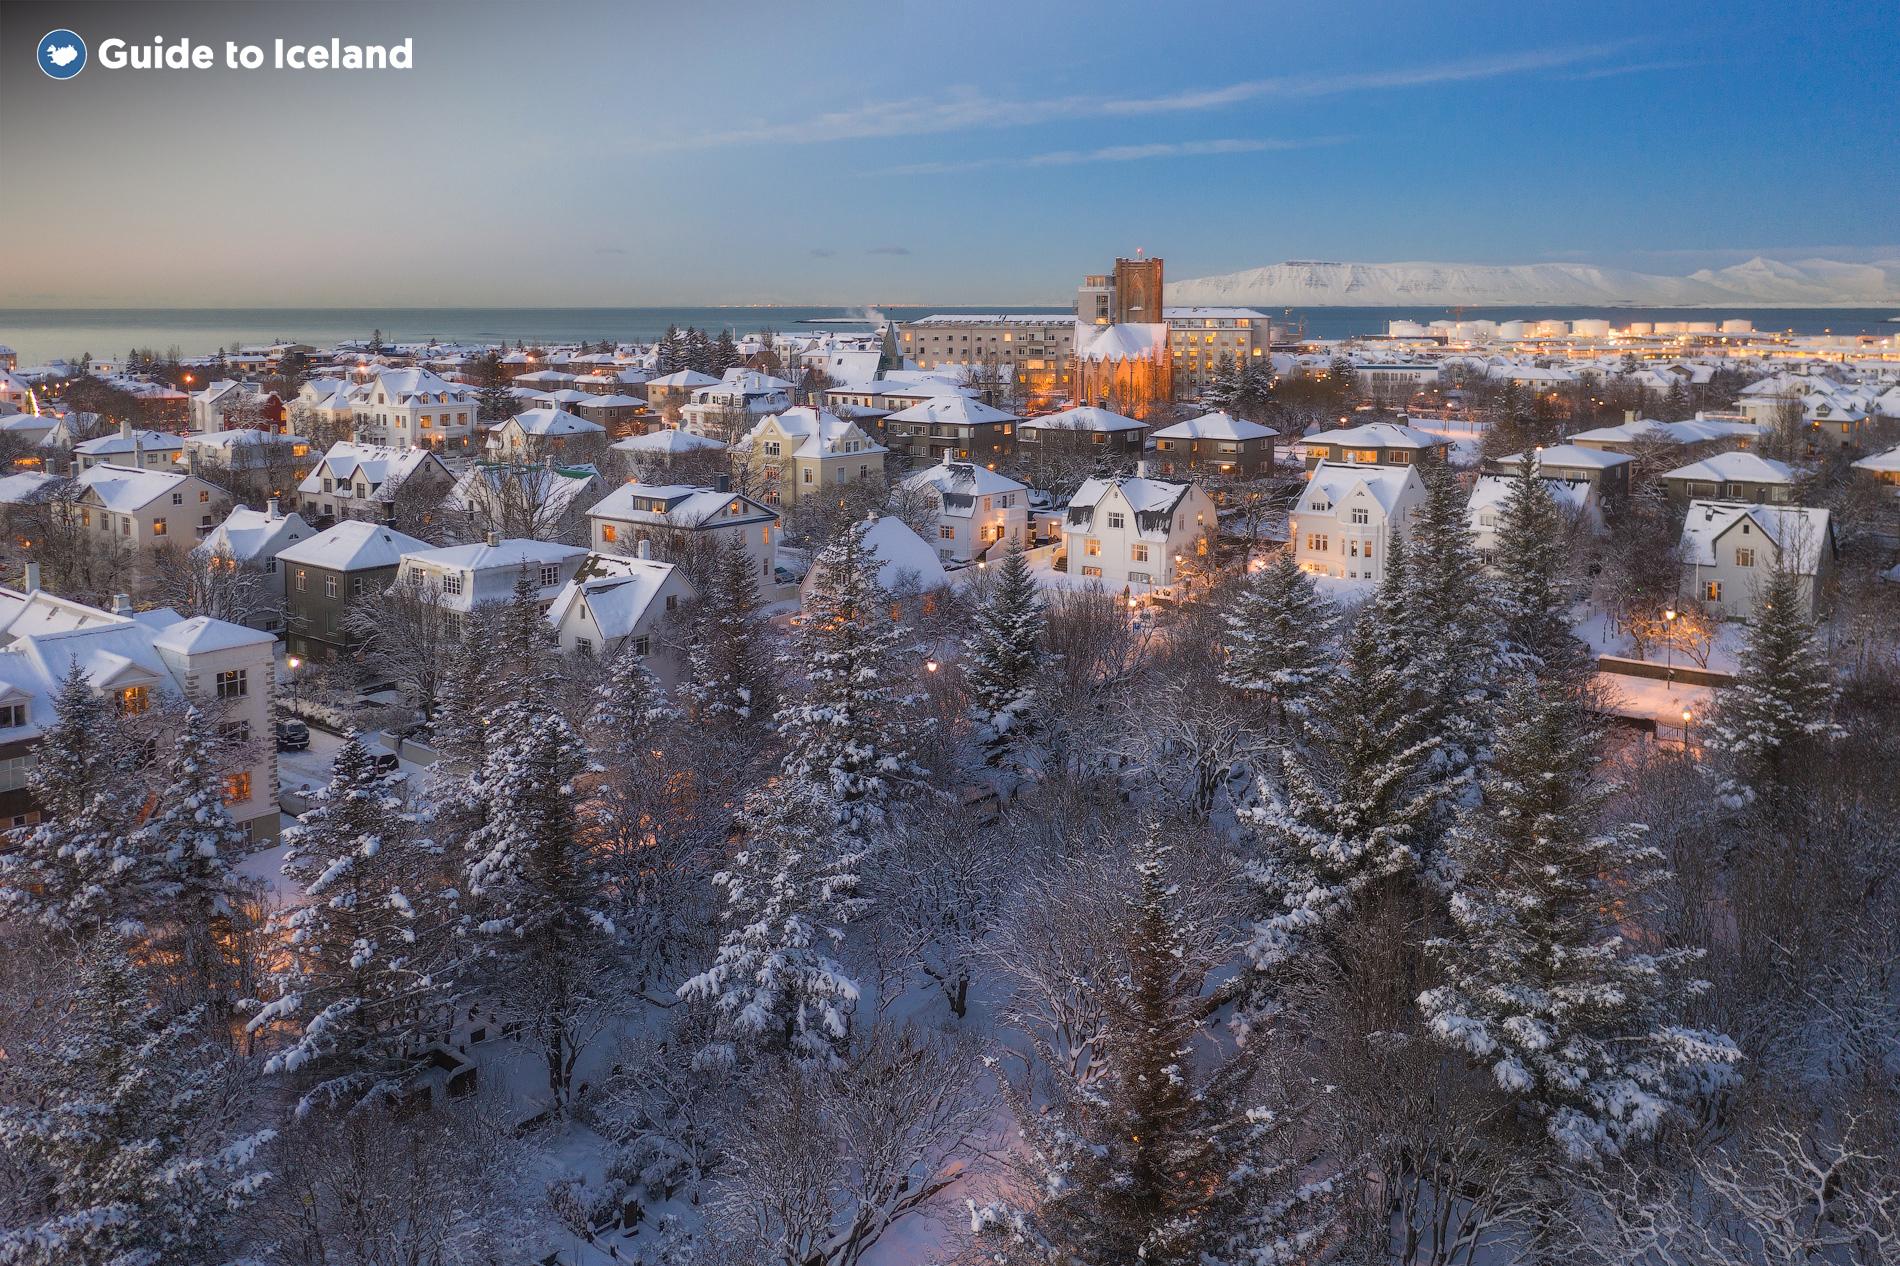 Reykjavik covered in snow becomes a festive wonderland.